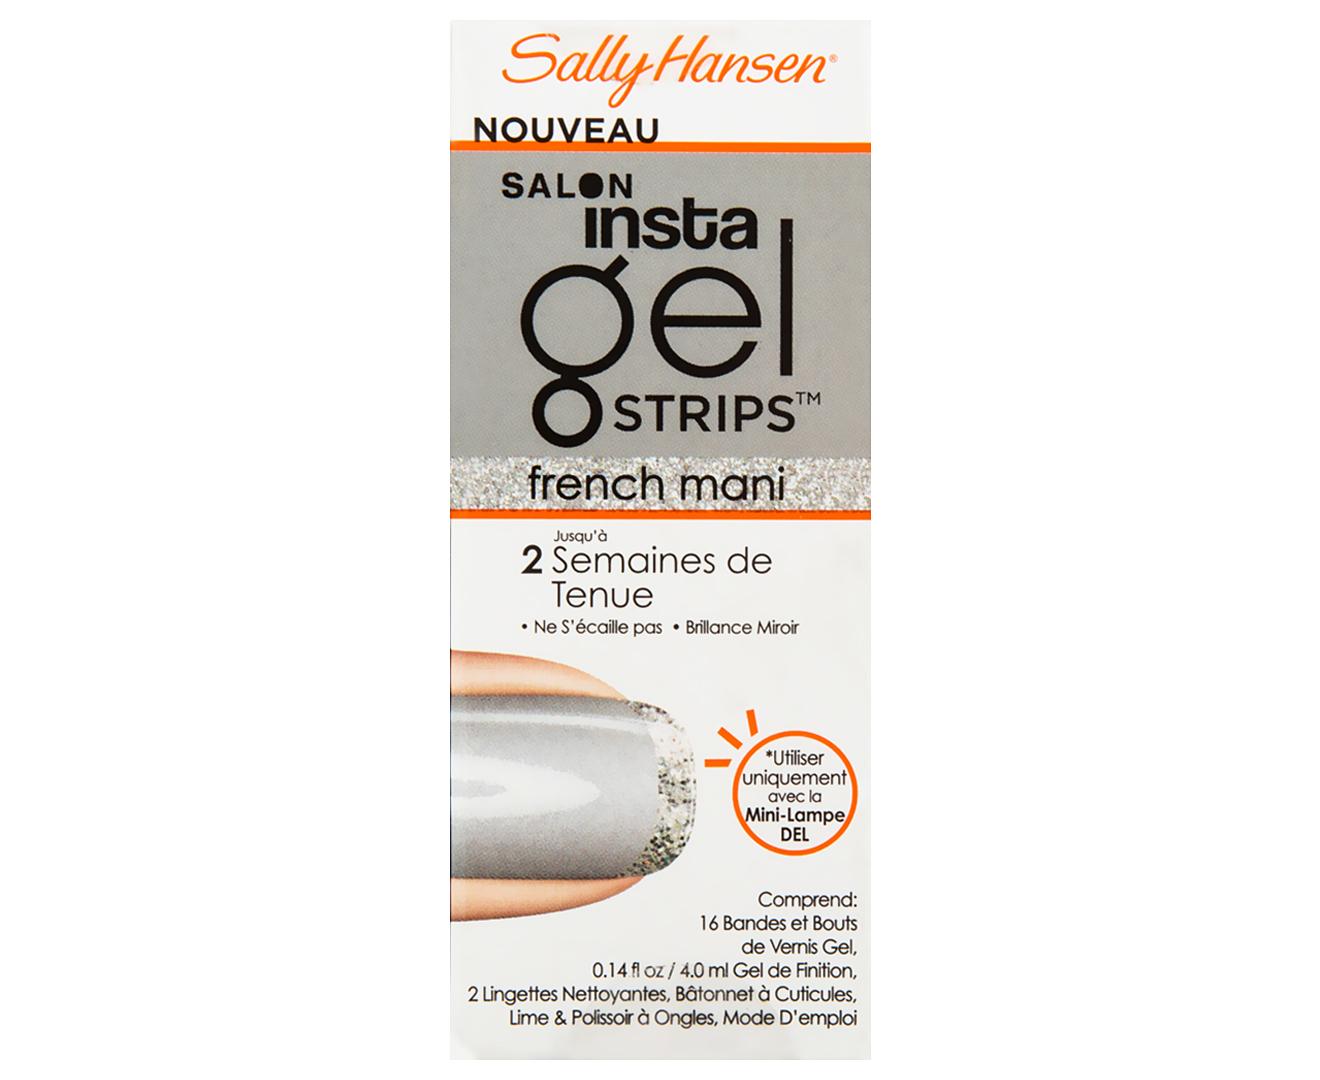 sally hansen led gel polish instructions